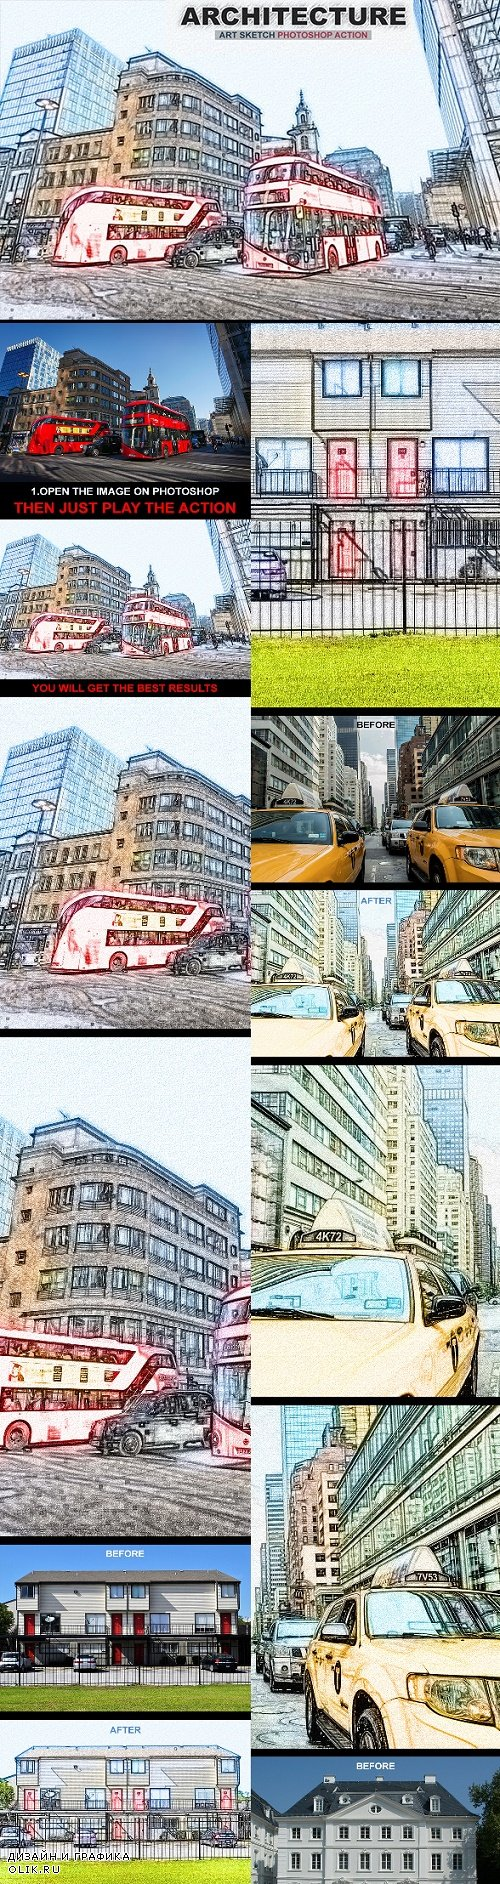 Architecture Art Sketch Photoshop Action - 22822619 - 3177347